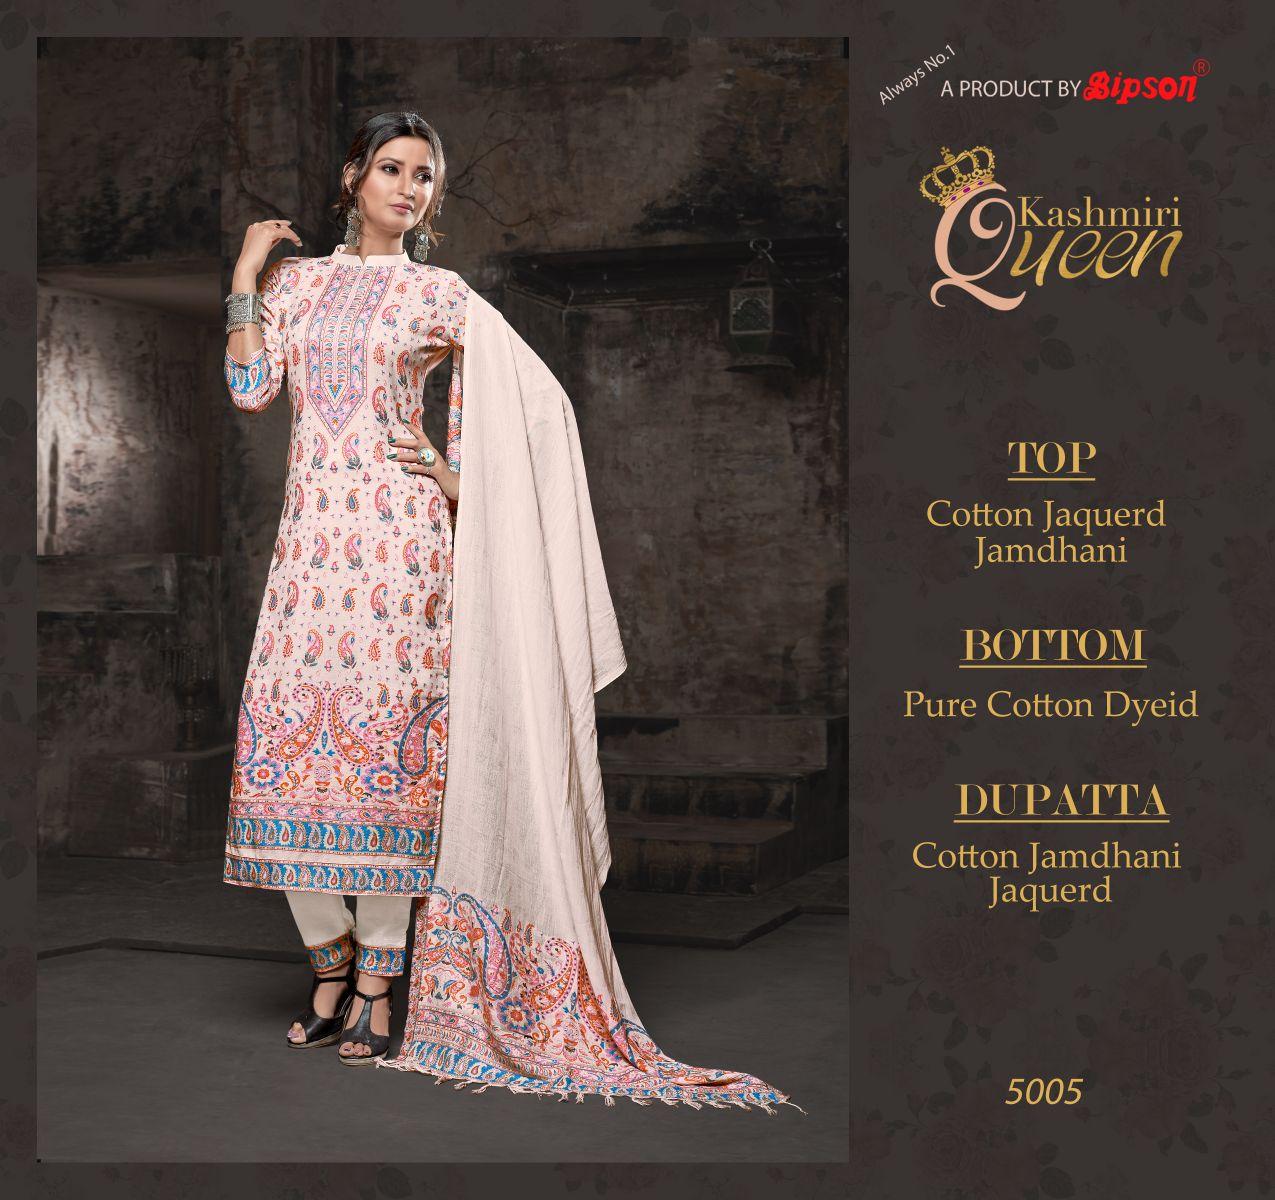 Bipson Kashmiri Queen 5005